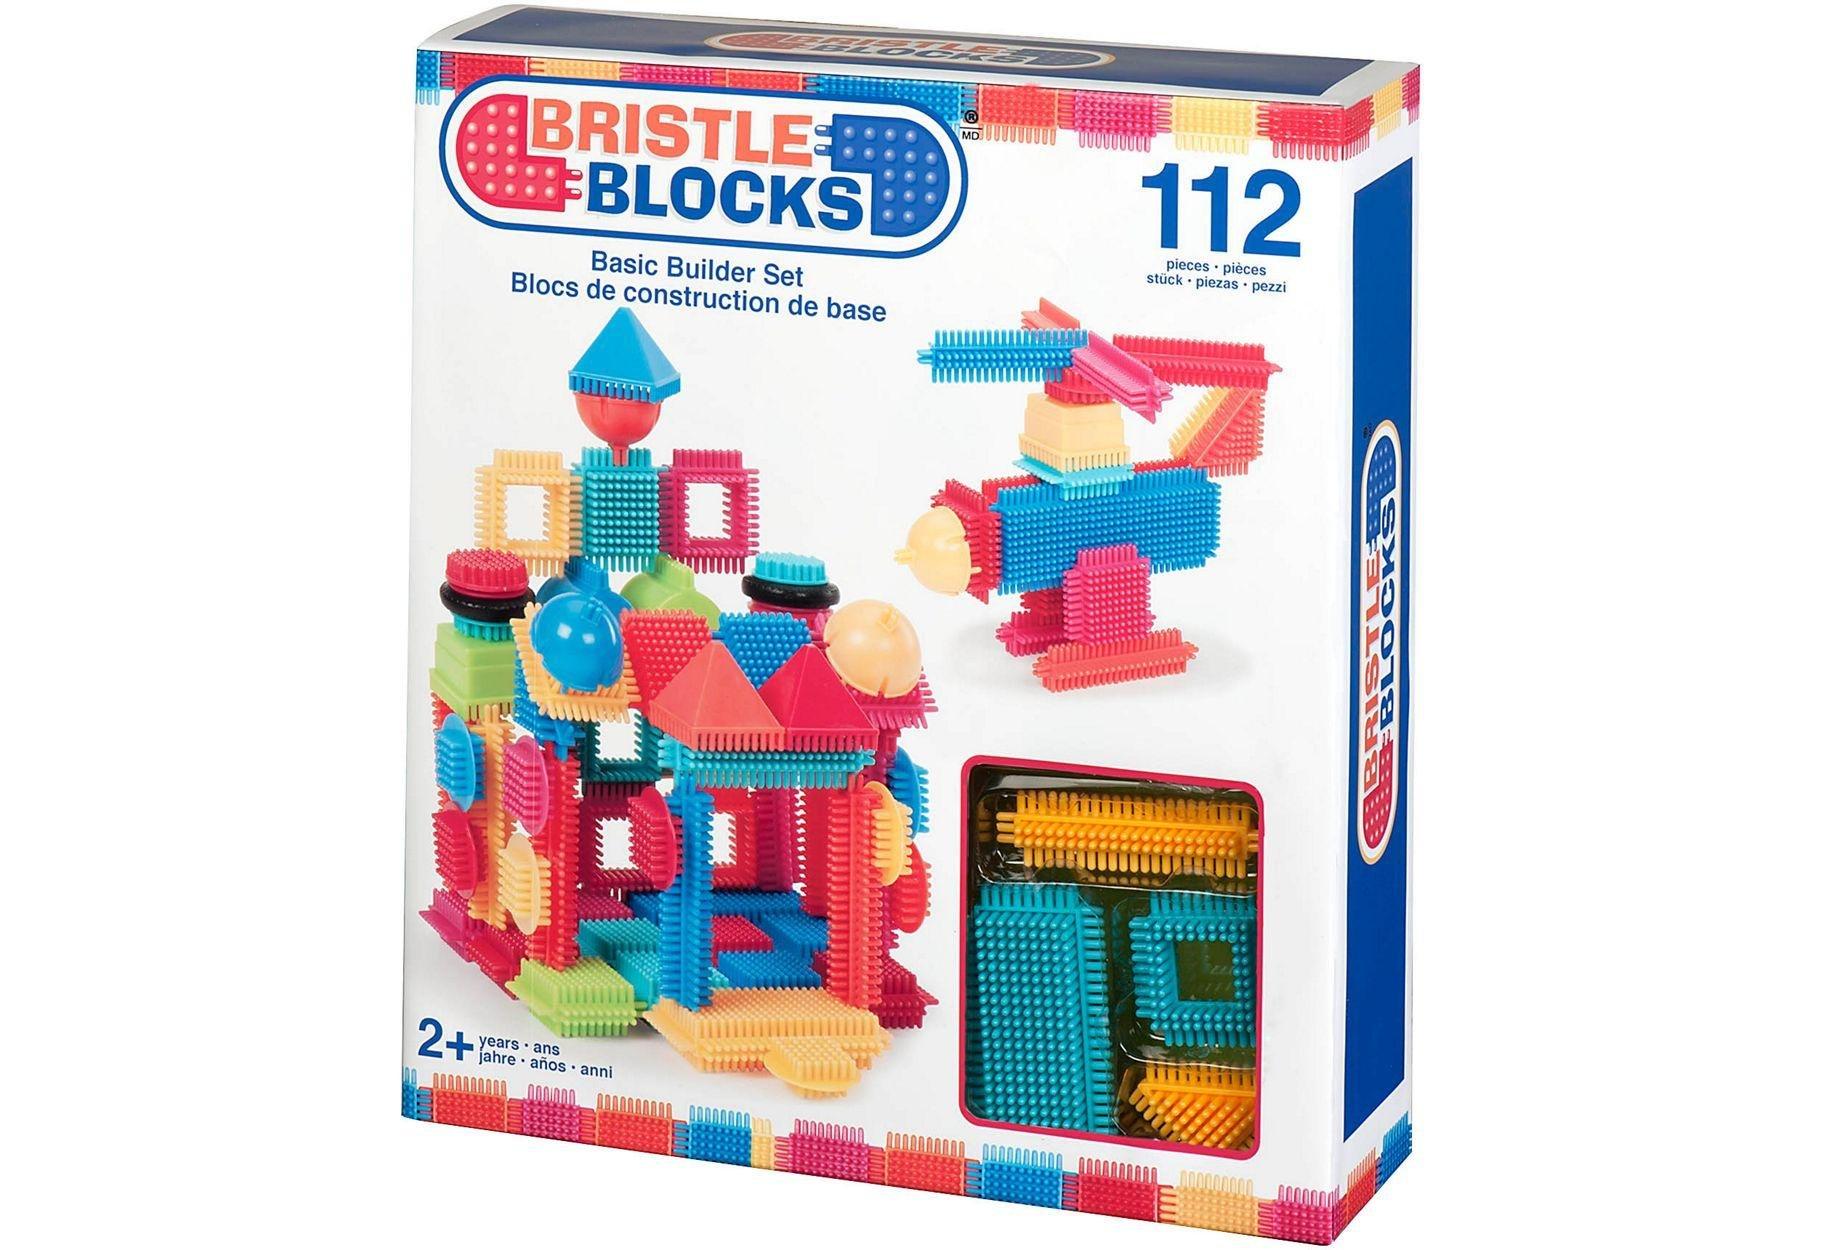 Image of Bristle Blocks Basic Builder Box - 112 Piece.